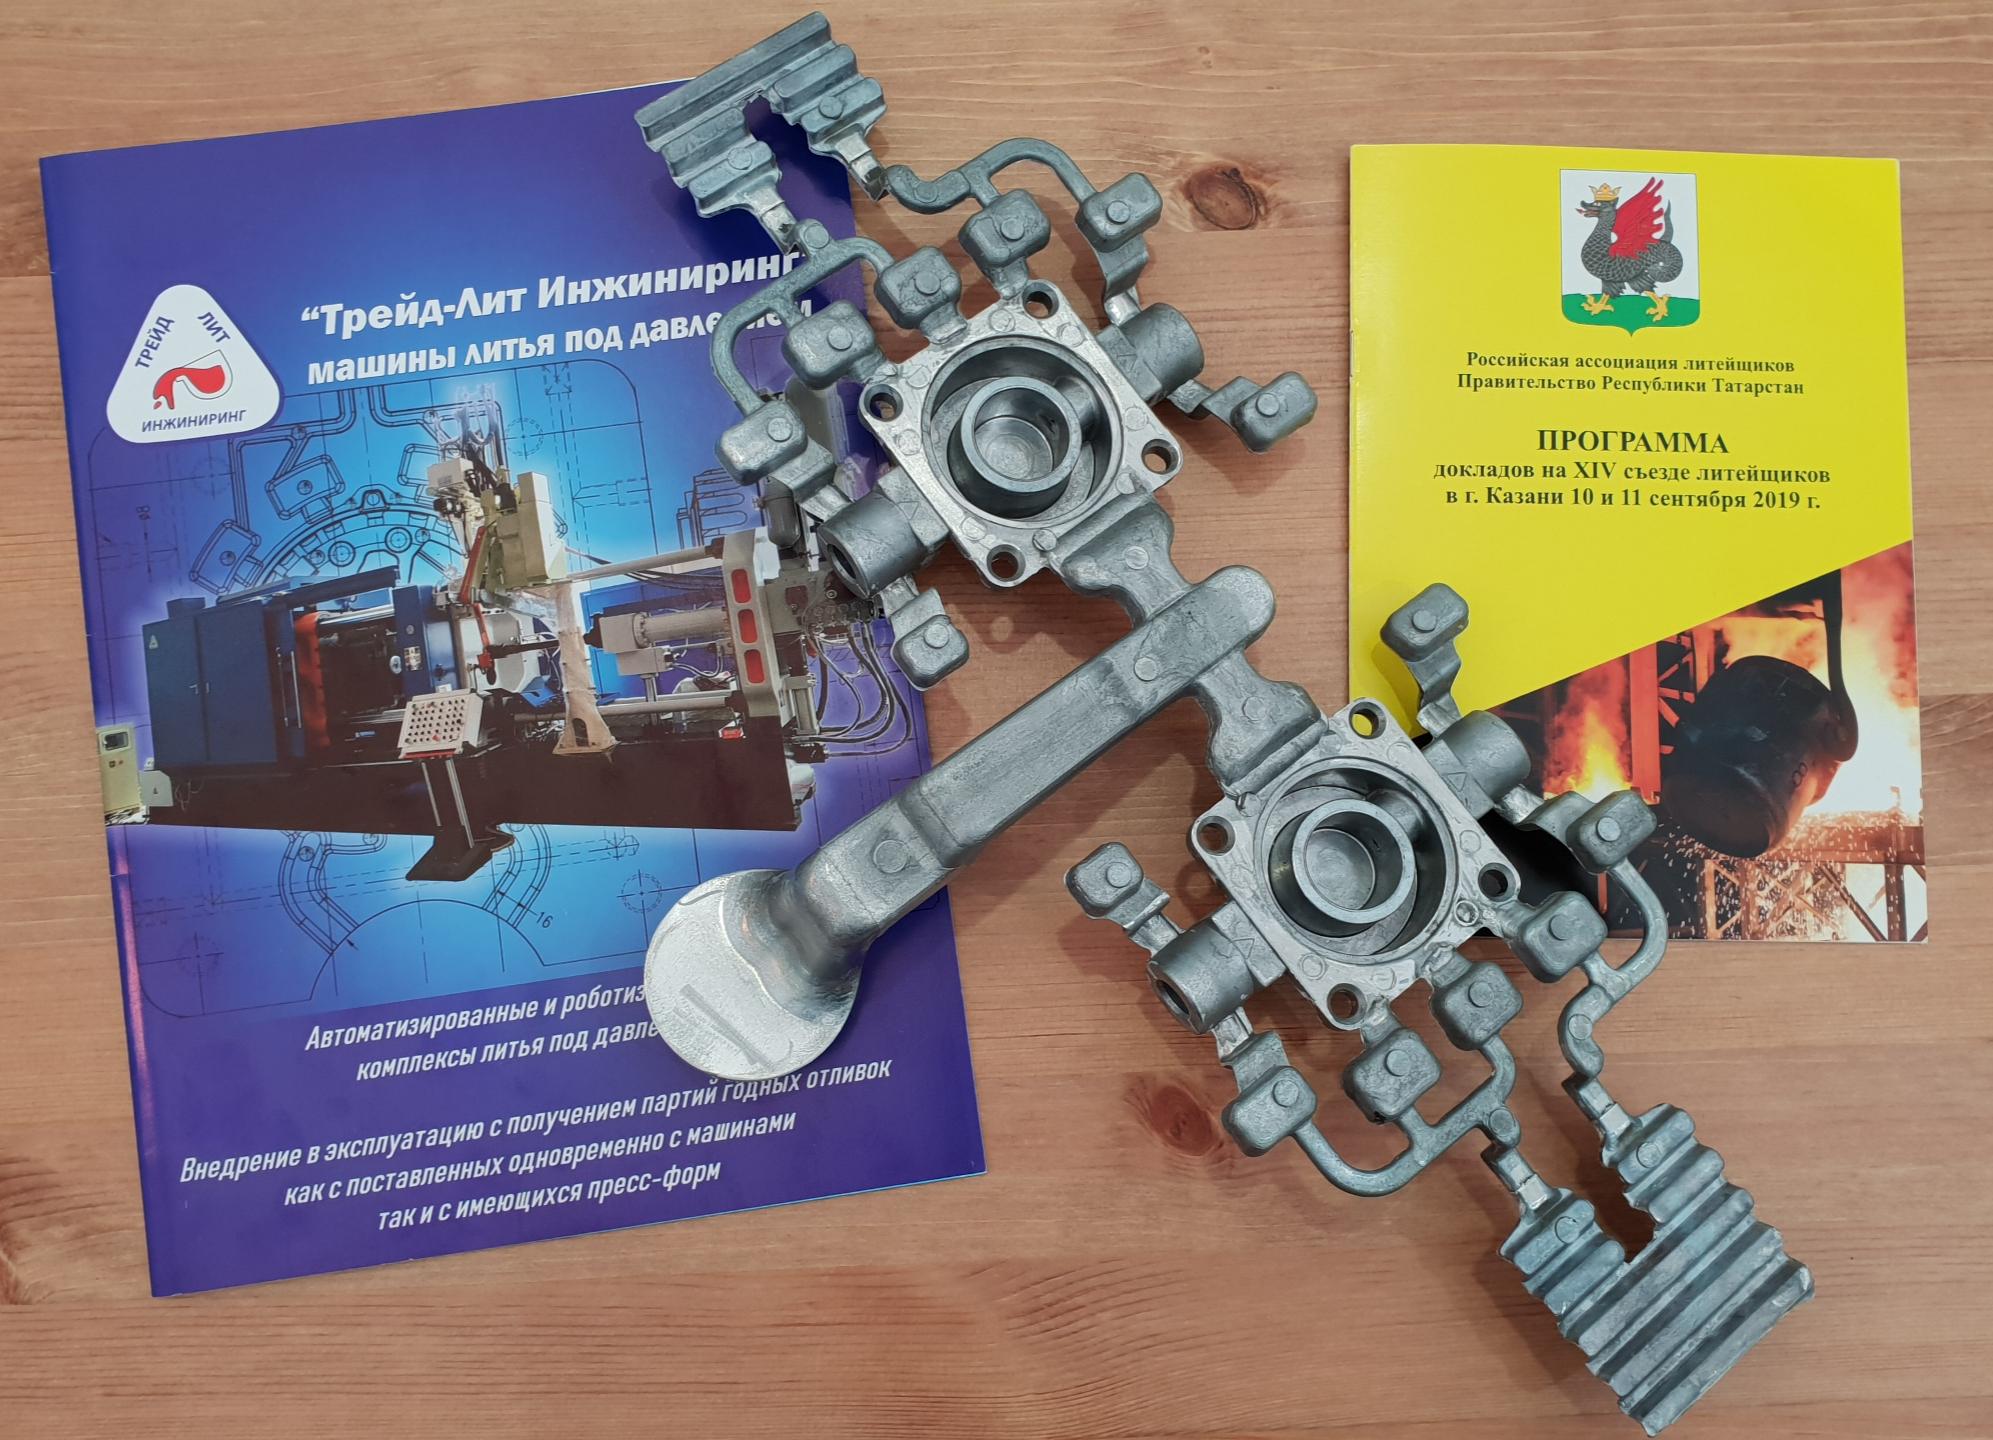 Программ съезда и отливка корпус газового счетчика